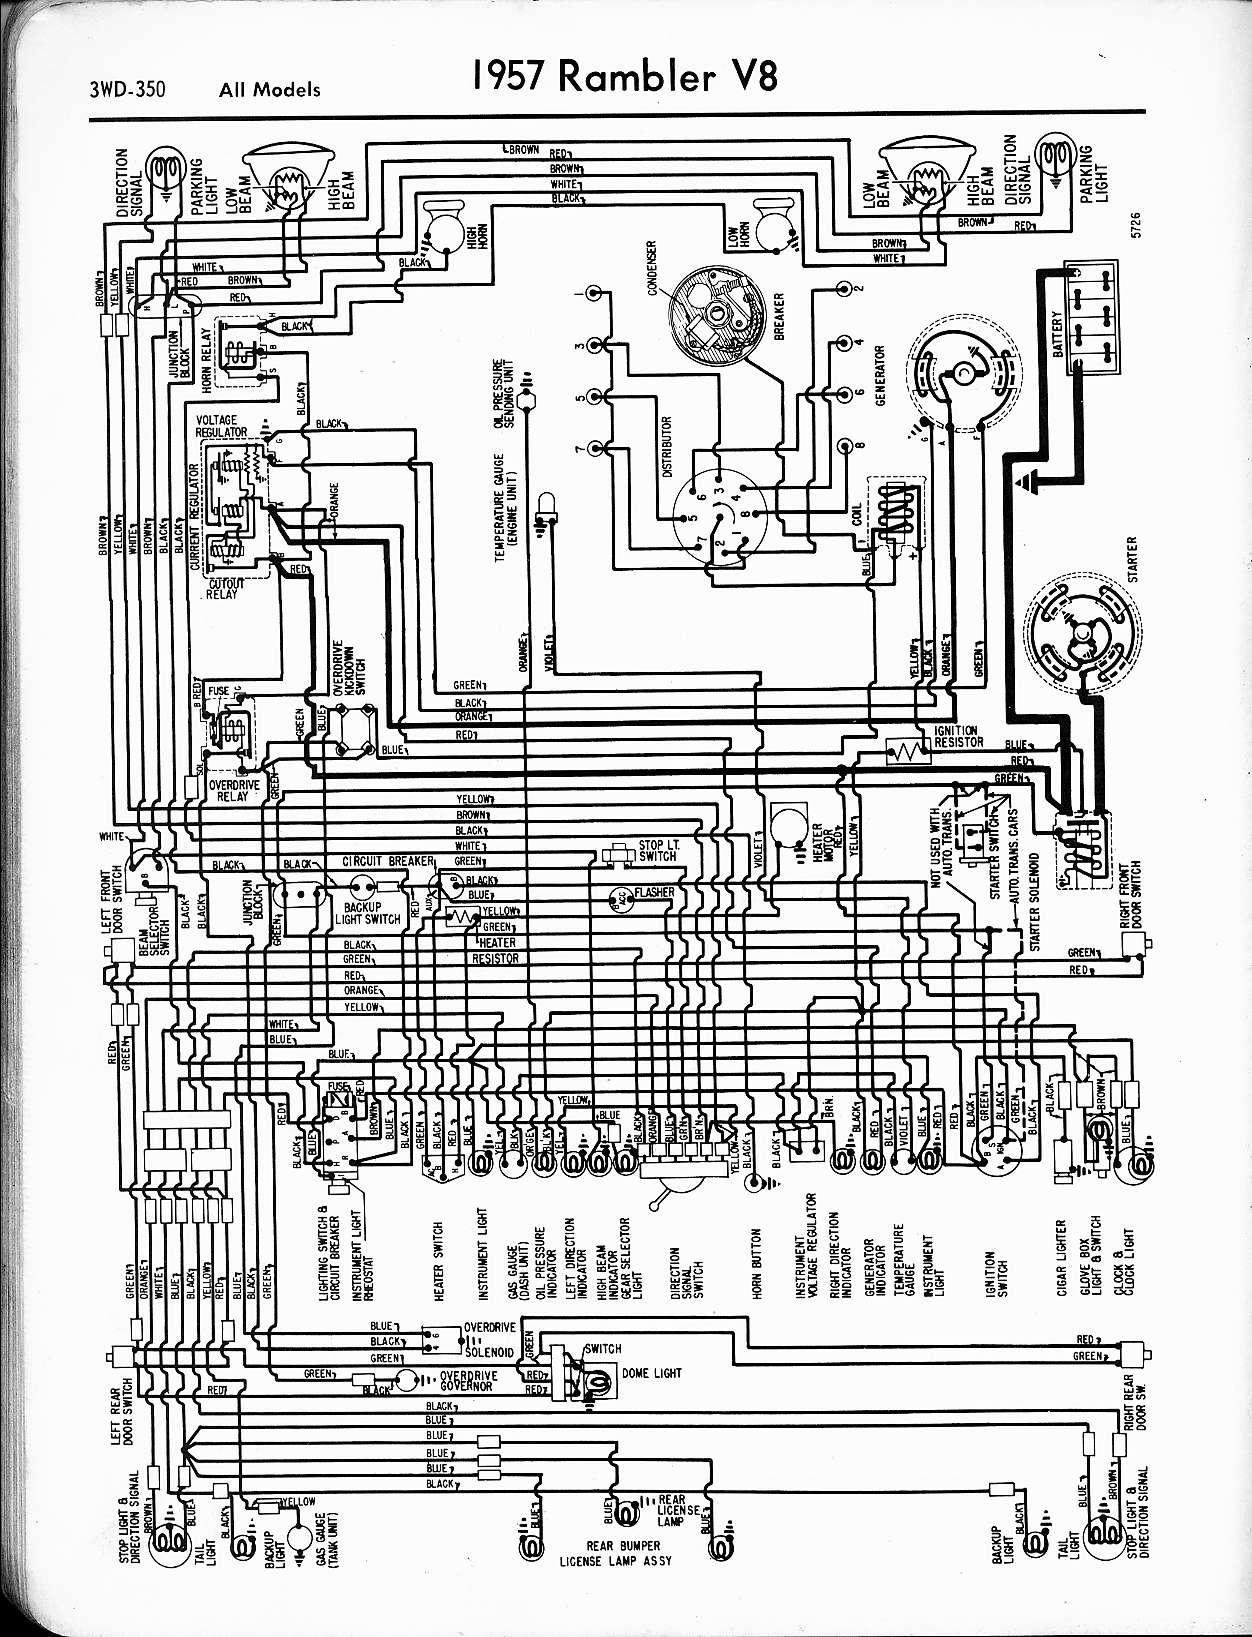 Astonishing Rambler Wiring Diagrams The Old Car Manual Project Wiring Cloud Licukshollocom